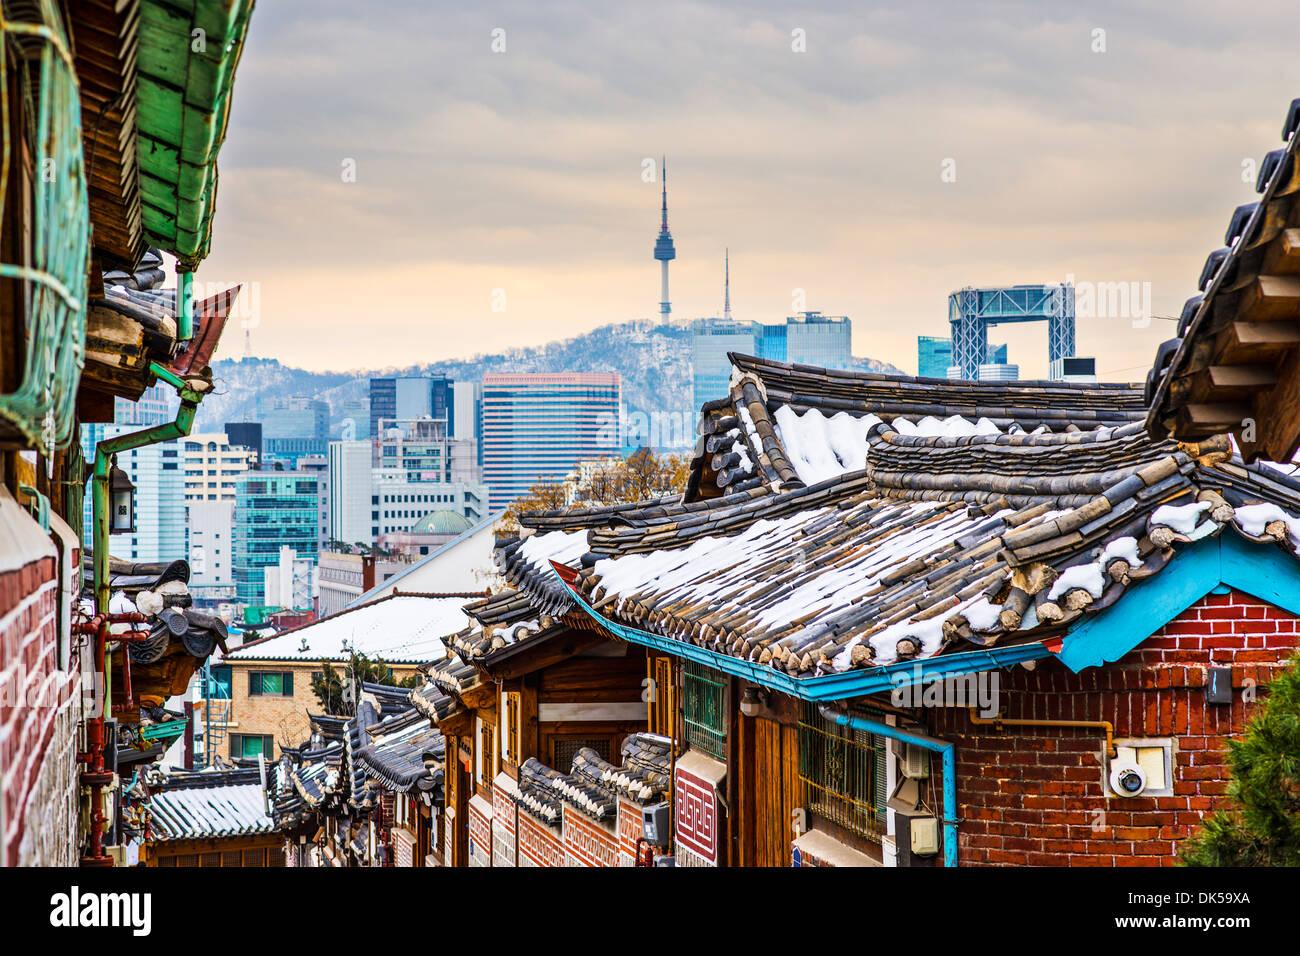 Seoul, South Korea at the Bukchon Hanok historic district. - Stock Image